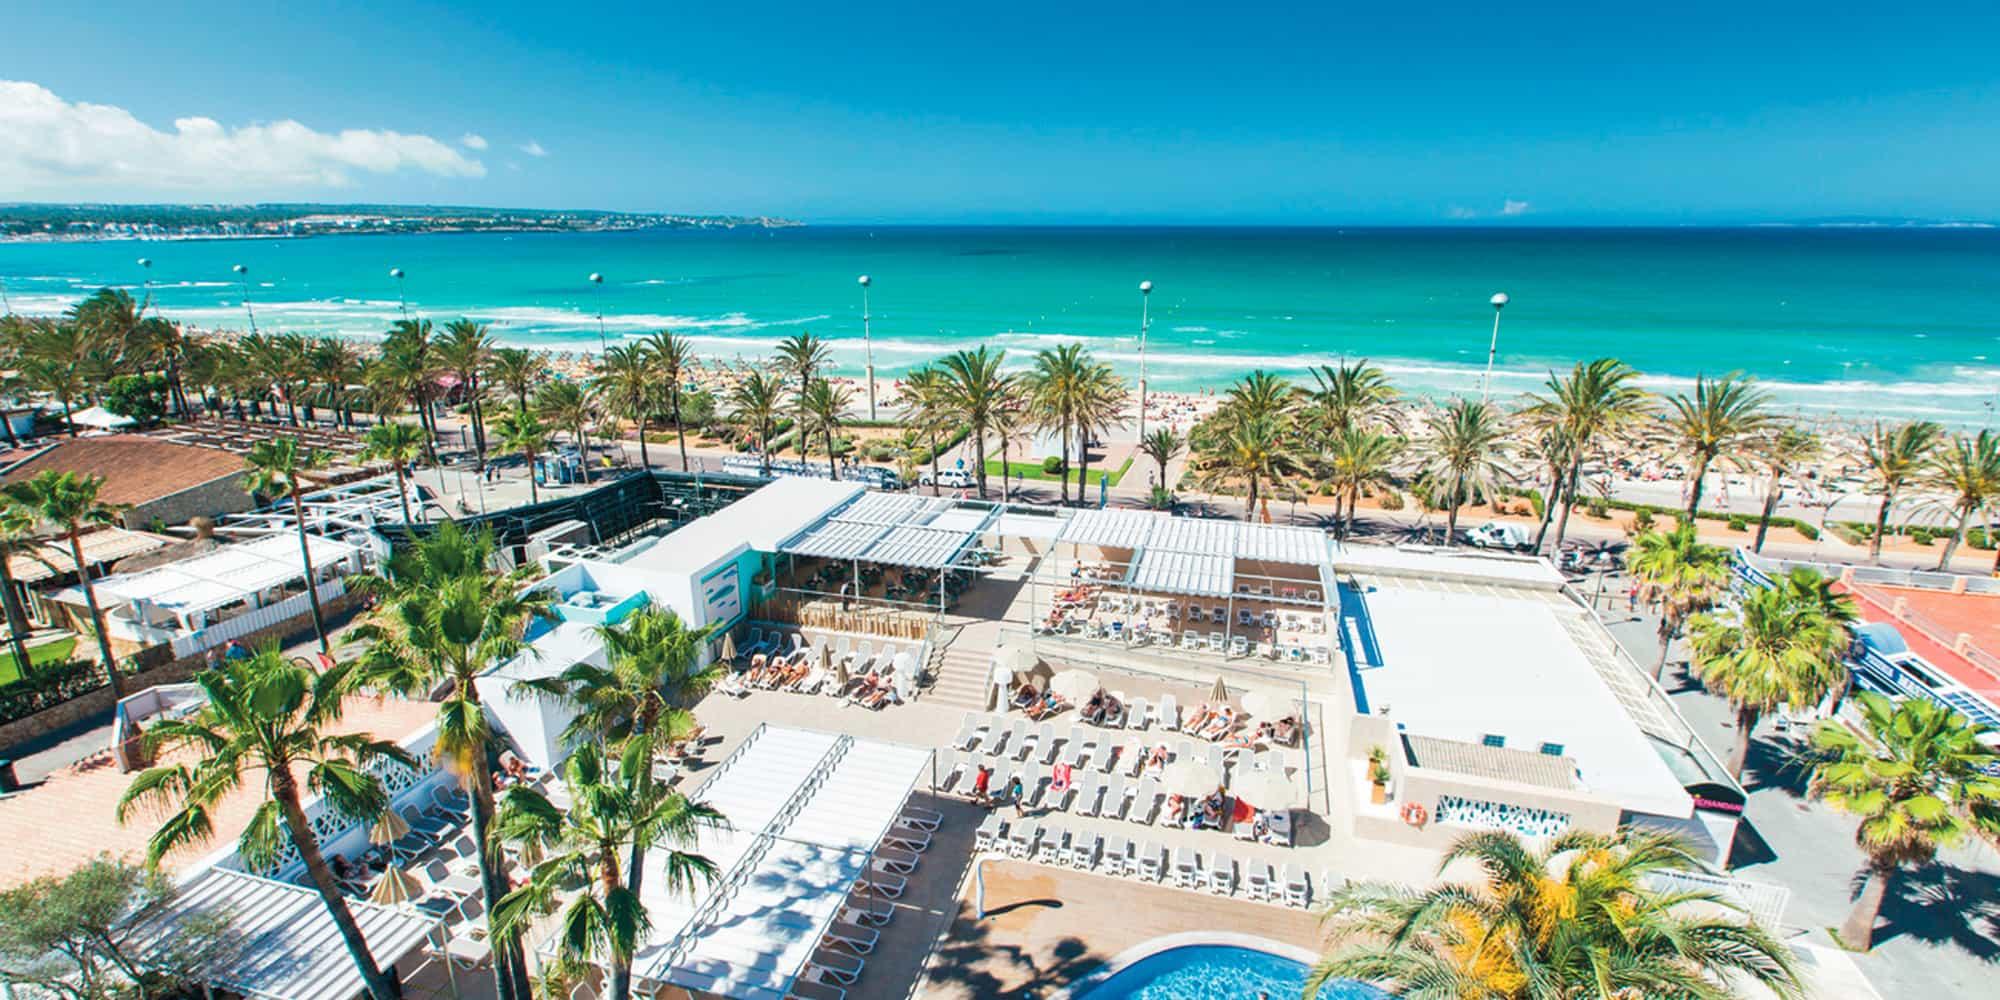 Hotel riu palace tres islas wellnesshotel strand van corralejo - Hotel Riu Palace Tres Islas Wellnesshotel Strand Van Corralejo 6